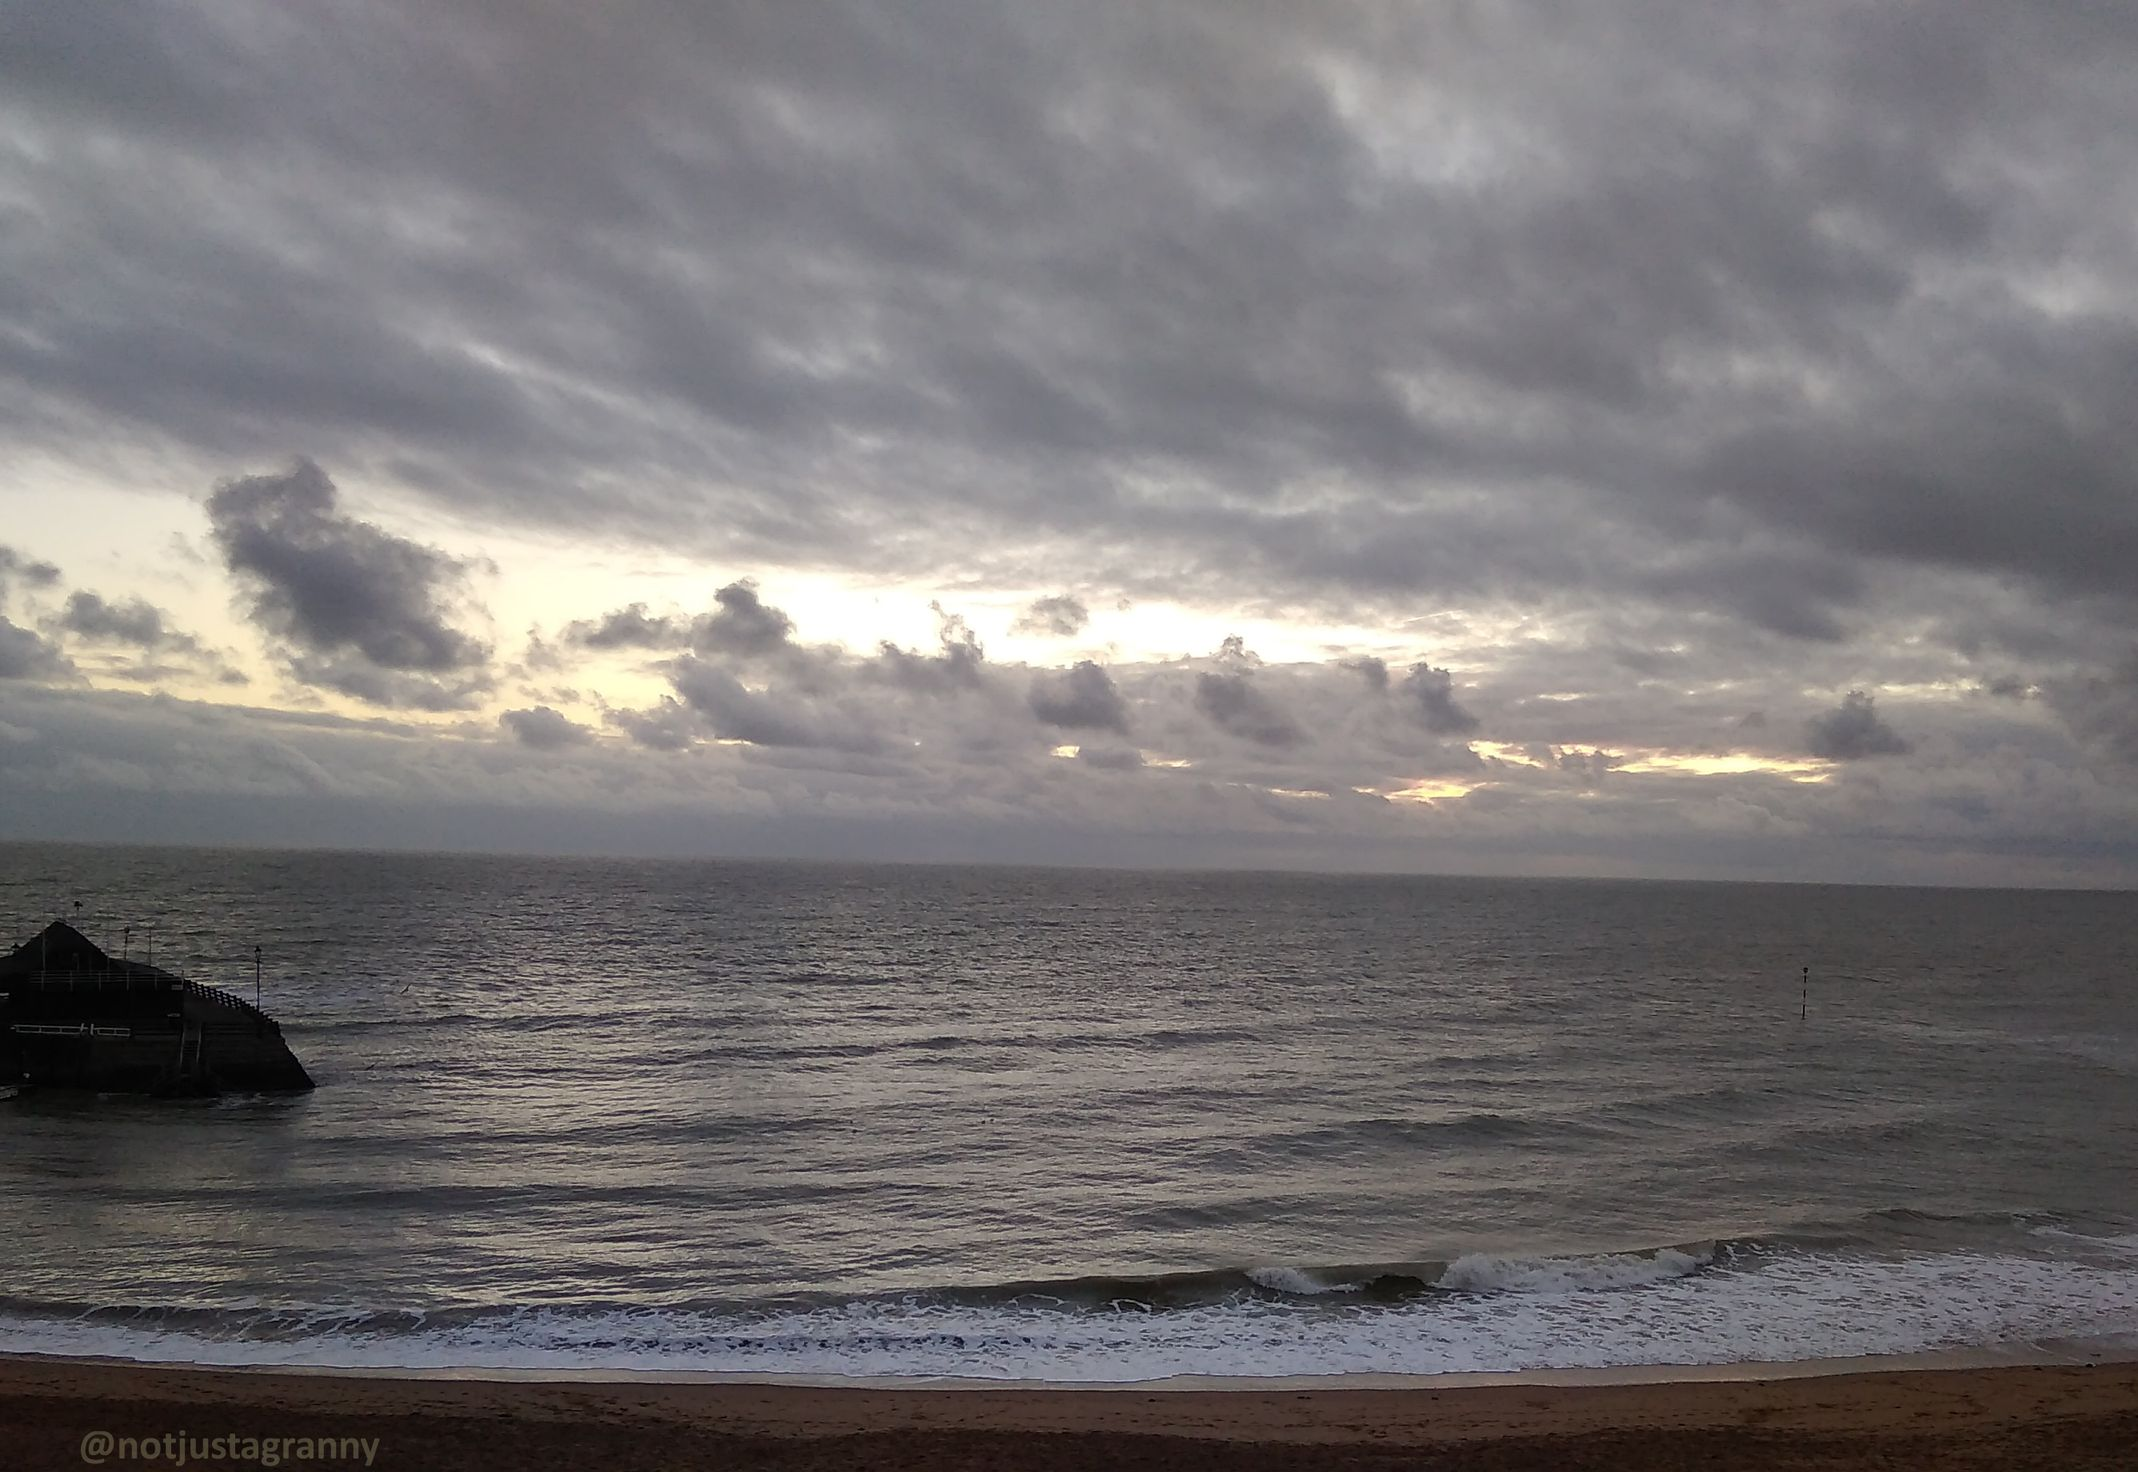 walk 1000 miles, walks along the english coast, coastal walks of england, the isle of thanet, long distance walks uk